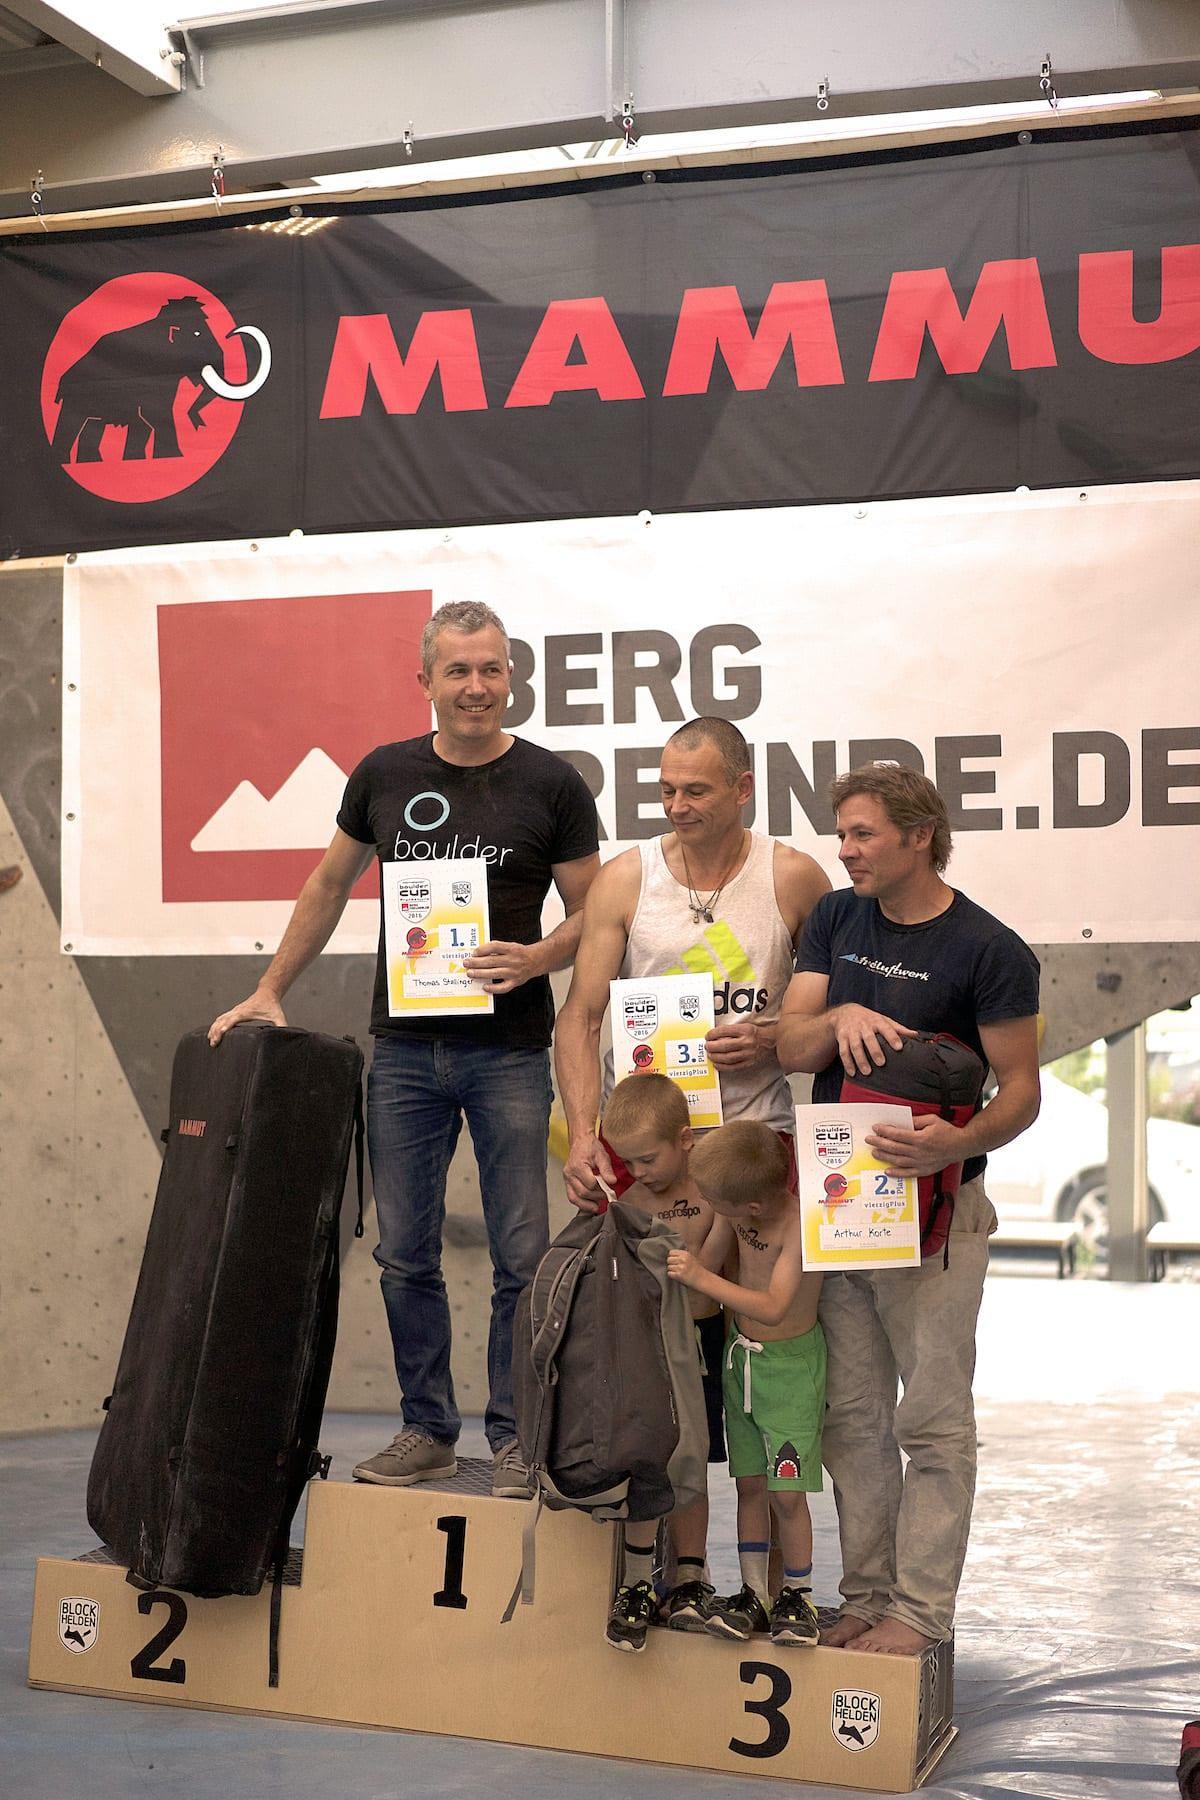 internationaler bouldercup Frankenjura 2016, BLOCKHELDEN Erlangen, Mammut, Bergfreunde.de, Boulderwettkampf07092016838